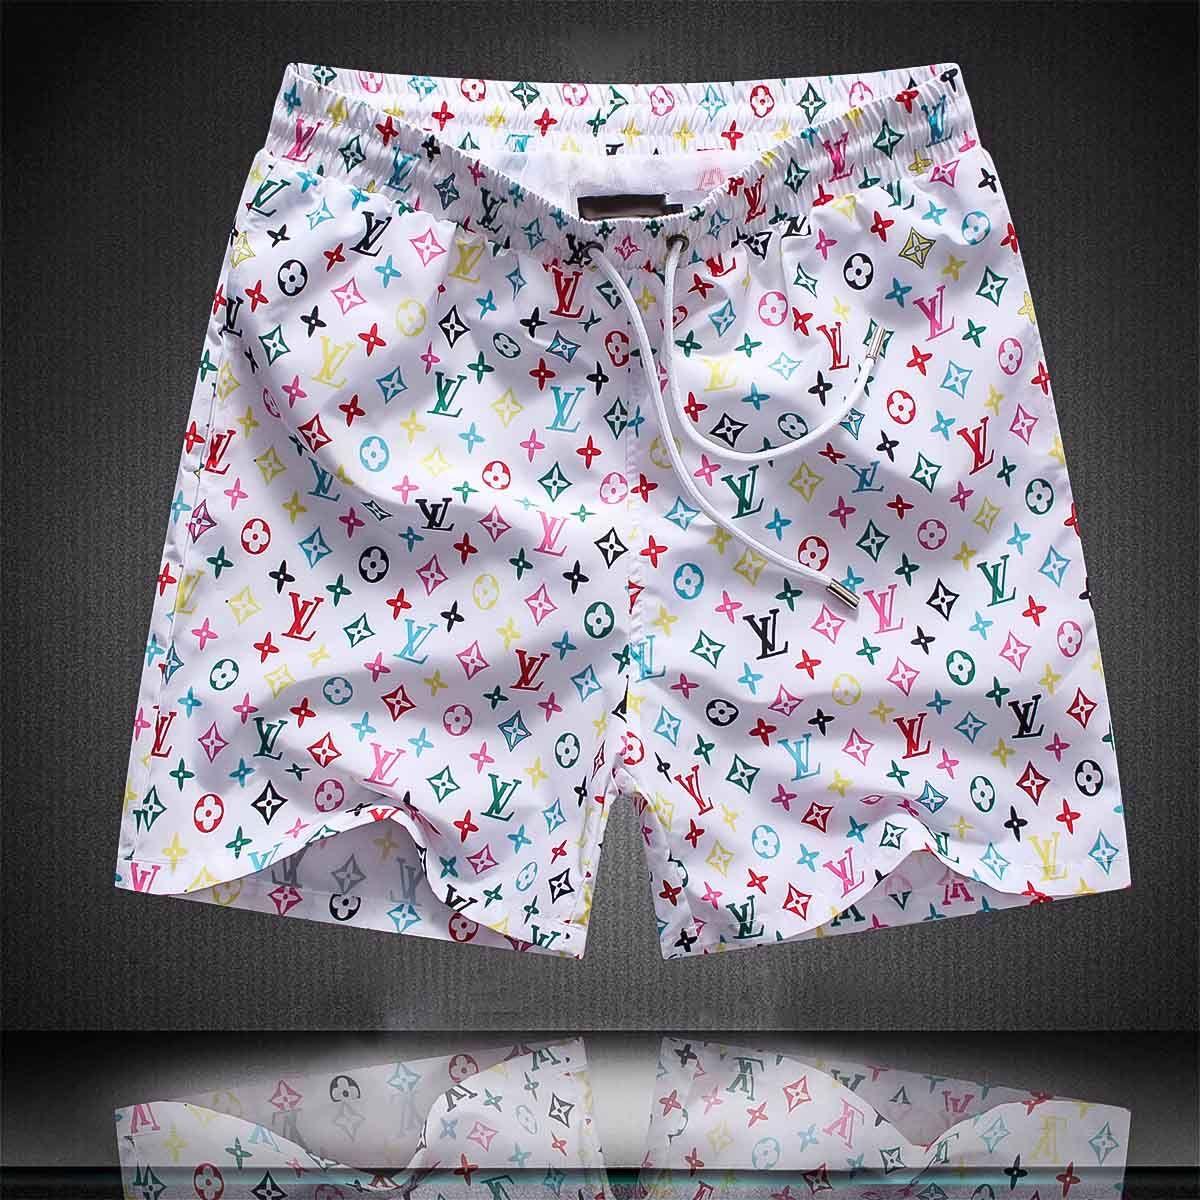 19SS Designerart Wasserdichtes Gewebe Runway Hose Sommer-Strand-Hosen der Männer Boardshorts Männer Surf Shorts Badehose Sport Shorts